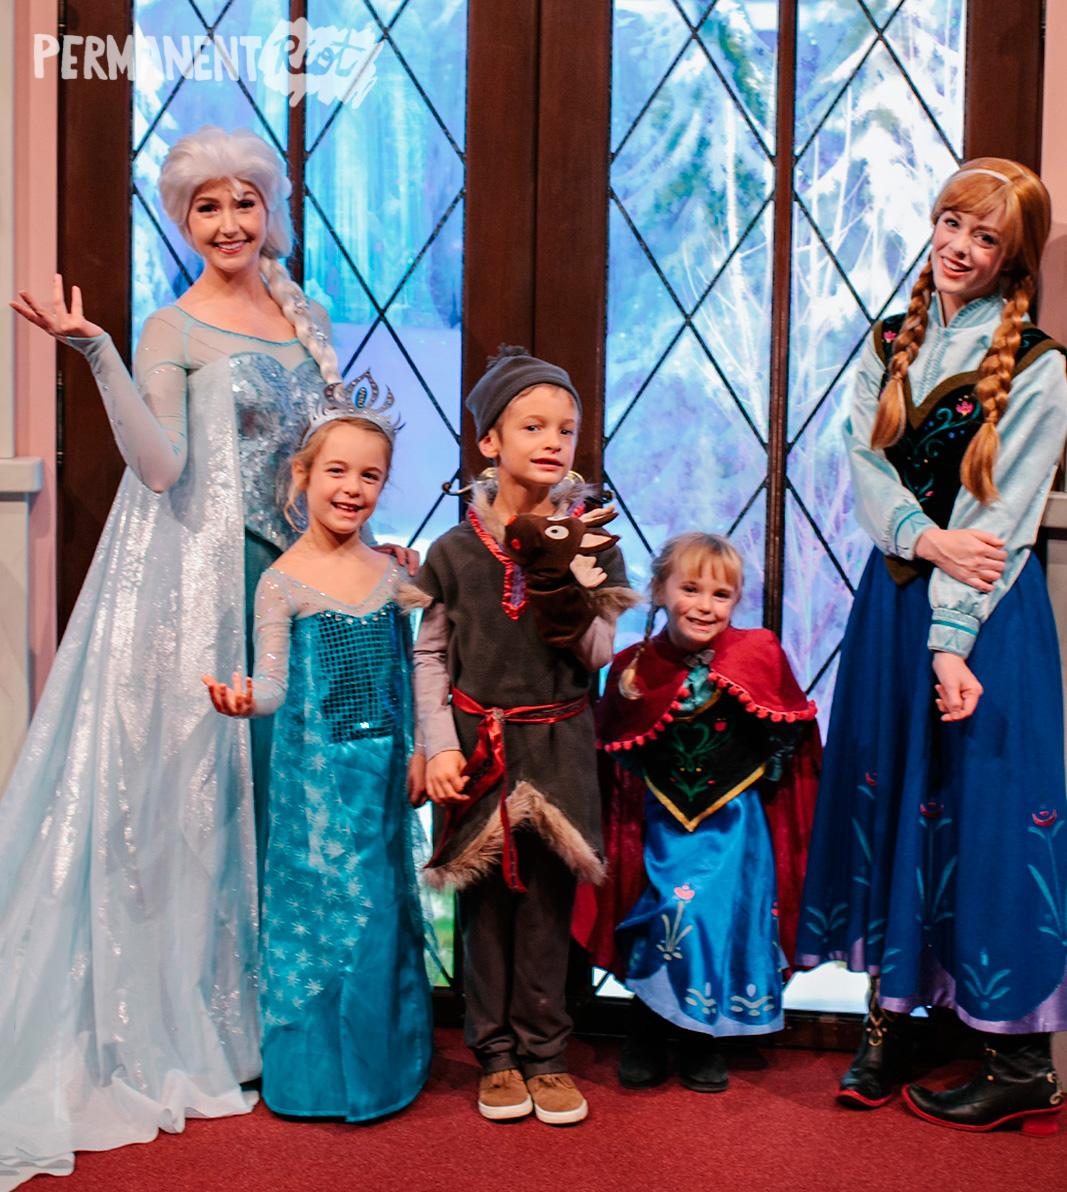 frozen family halloween costume  sc 1 st  Permanent Riot & Frozen family halloween costumes u2013 Anna Elsa u0026 Kristoff u2013 Permanent ...